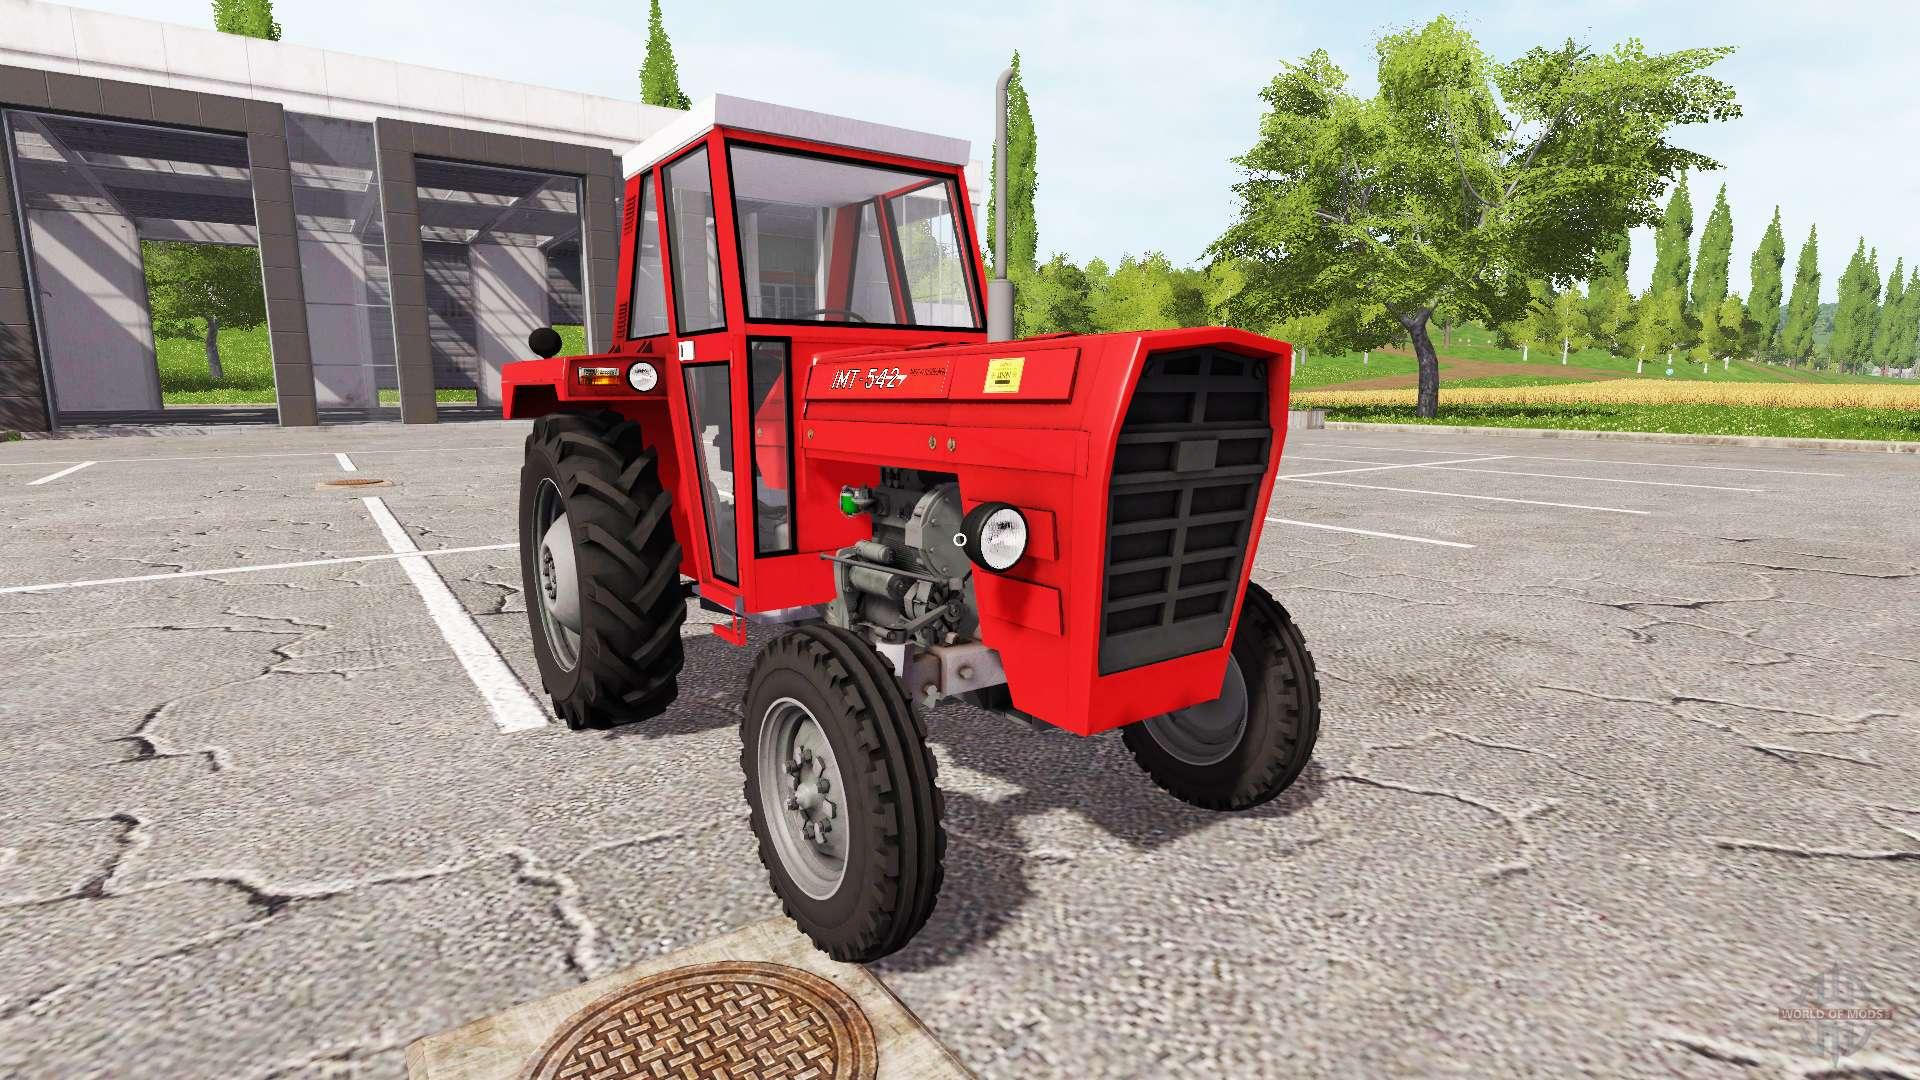 imt 542 deluxe for farming simulator 2017 rh worldofmods com IMT Tractor Parts USA IMT Tractor Parts USA